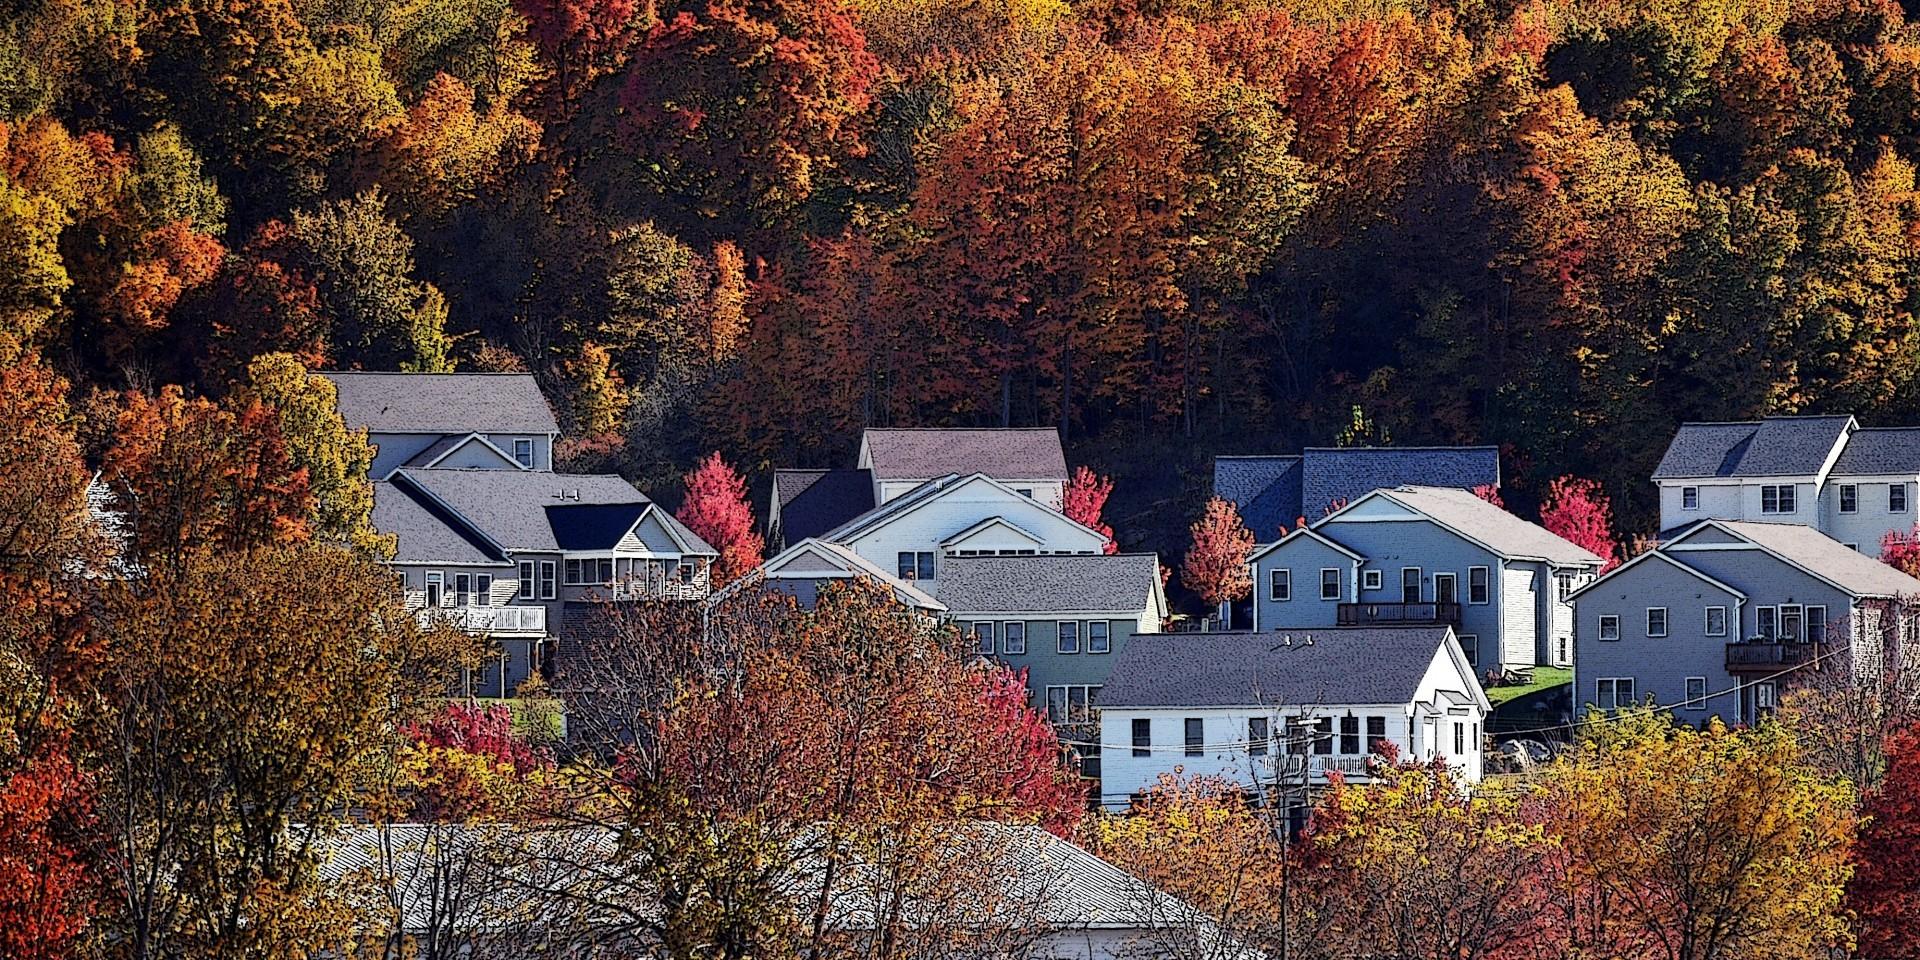 Drop in US home sales less drastic than predicted | Overseas | PropertyGuru.com.sg